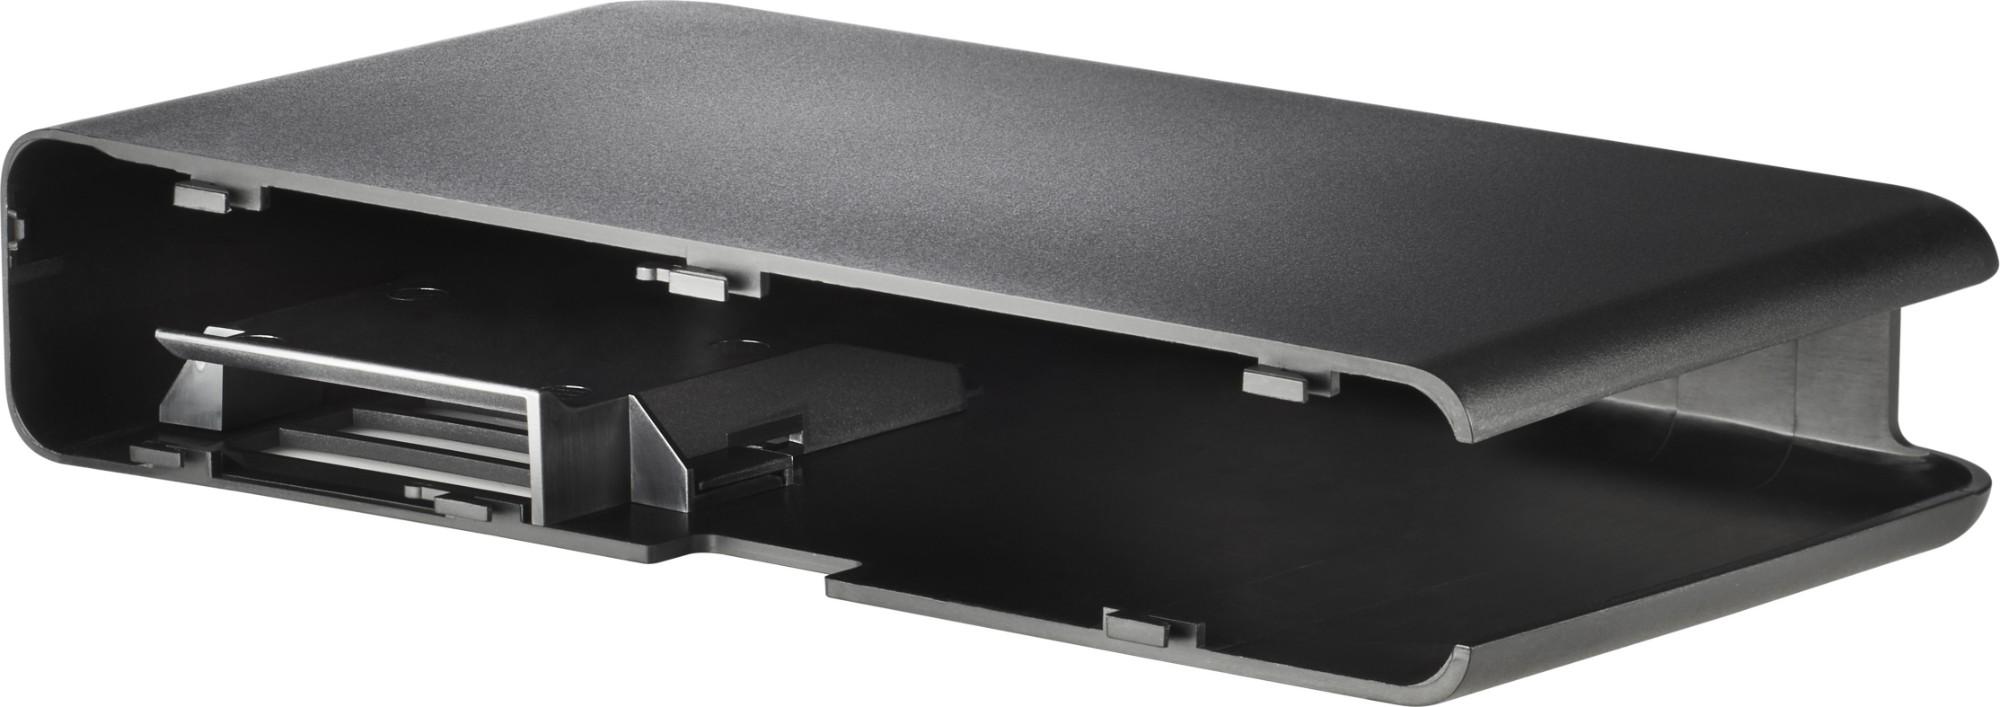 HP Desktop Mini G3 Port Cover Kit